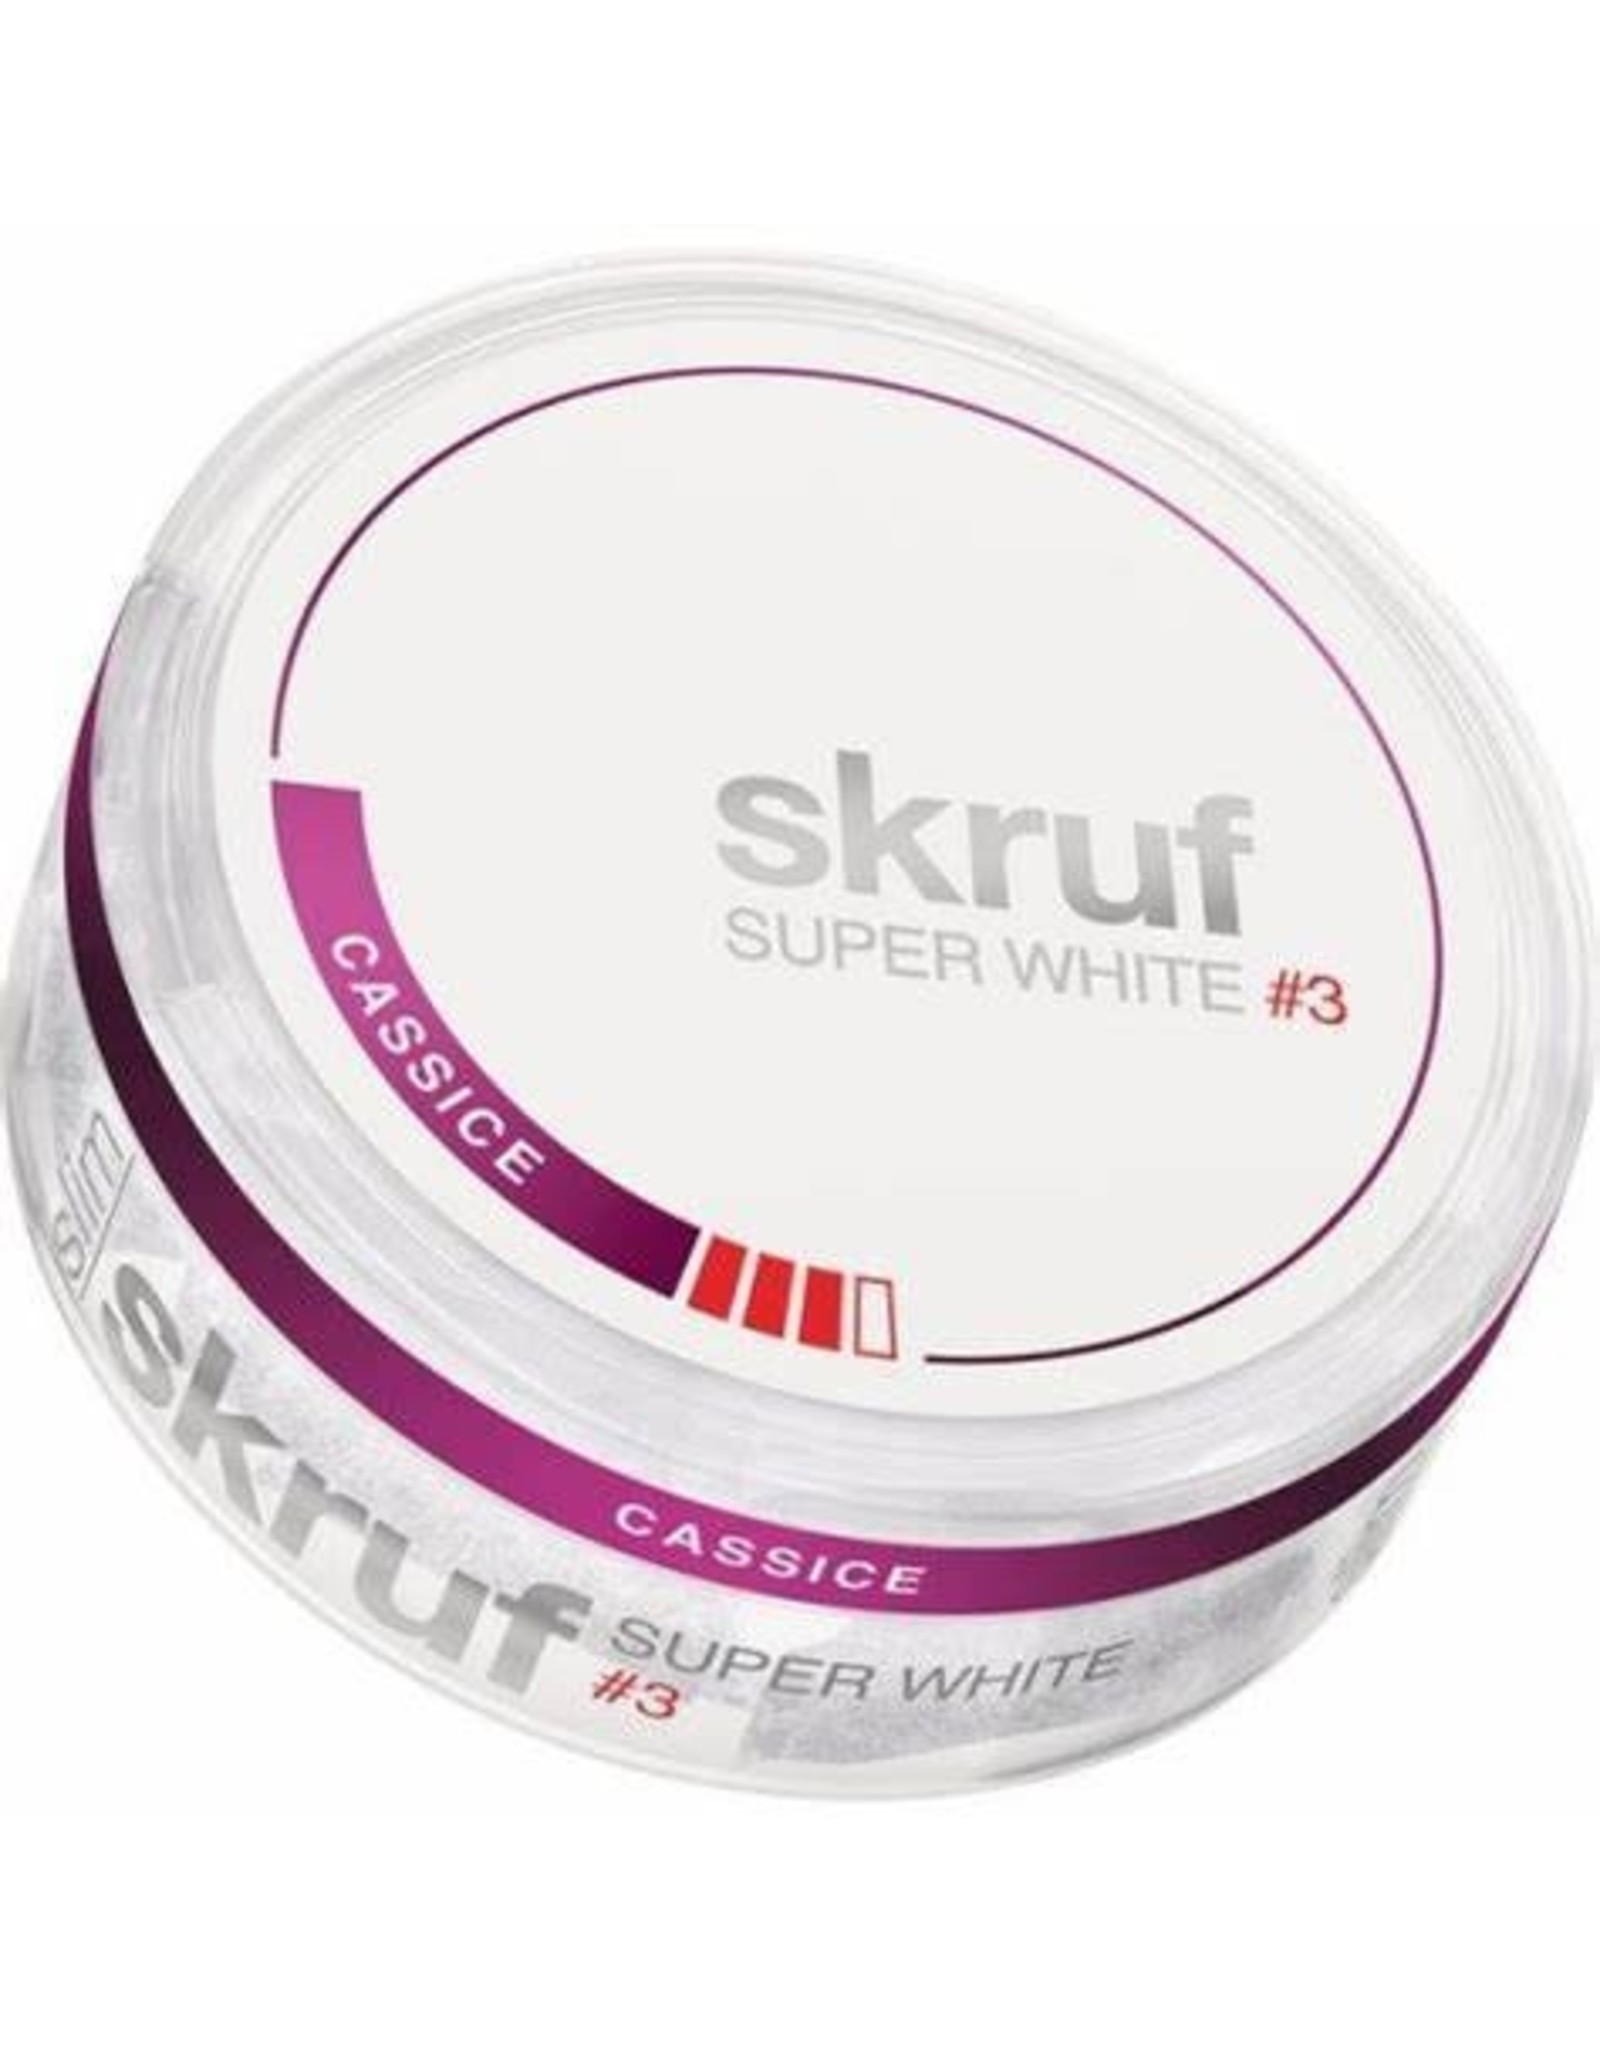 Skruf skruf Super White #3 Cassice